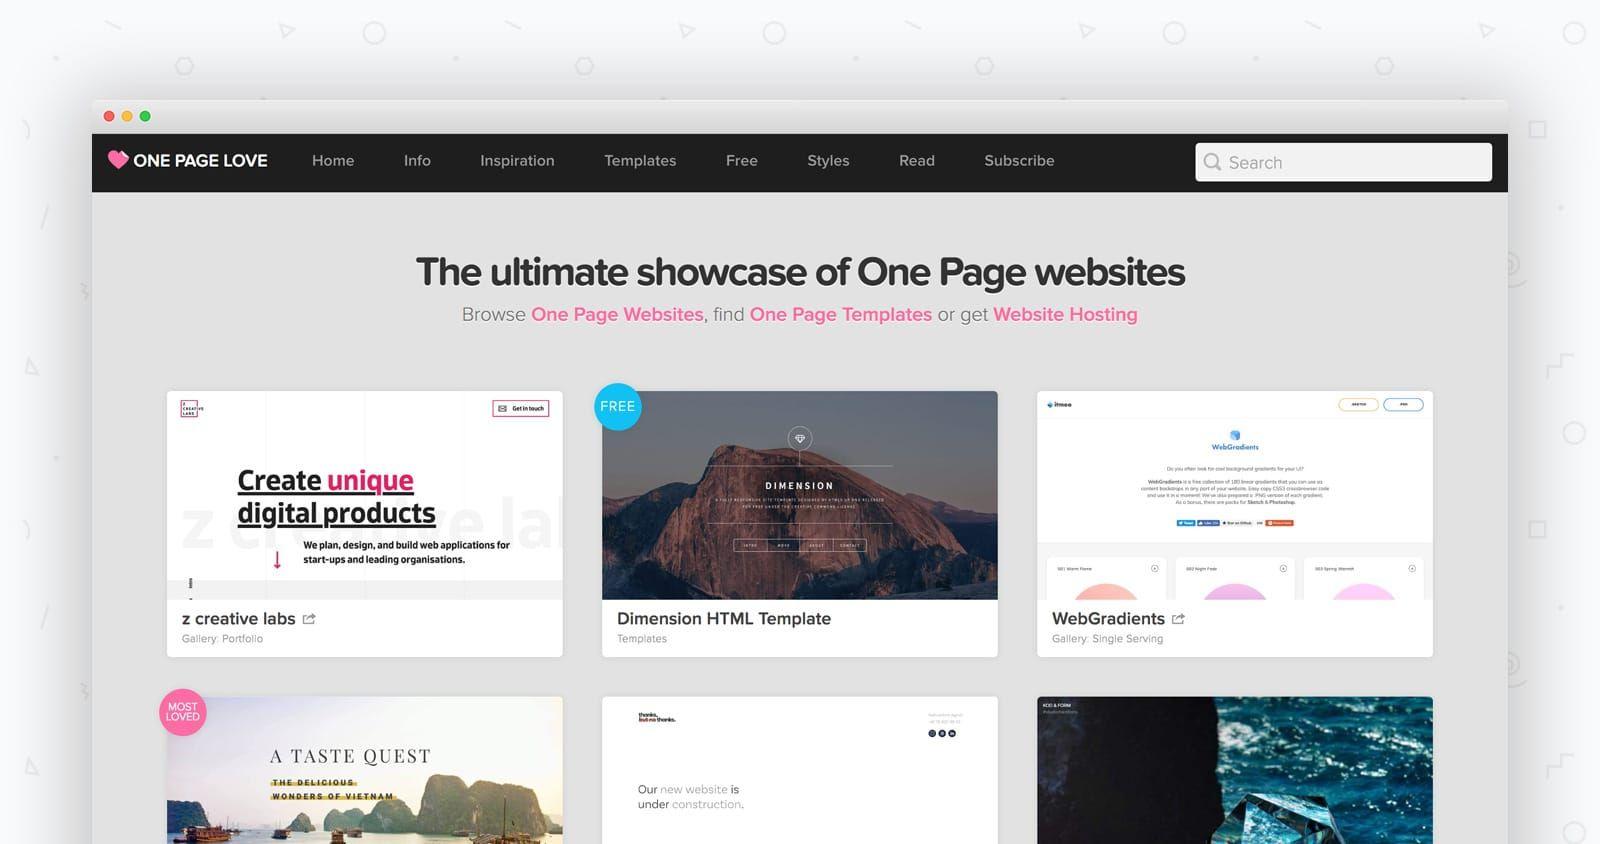 Websites to find love